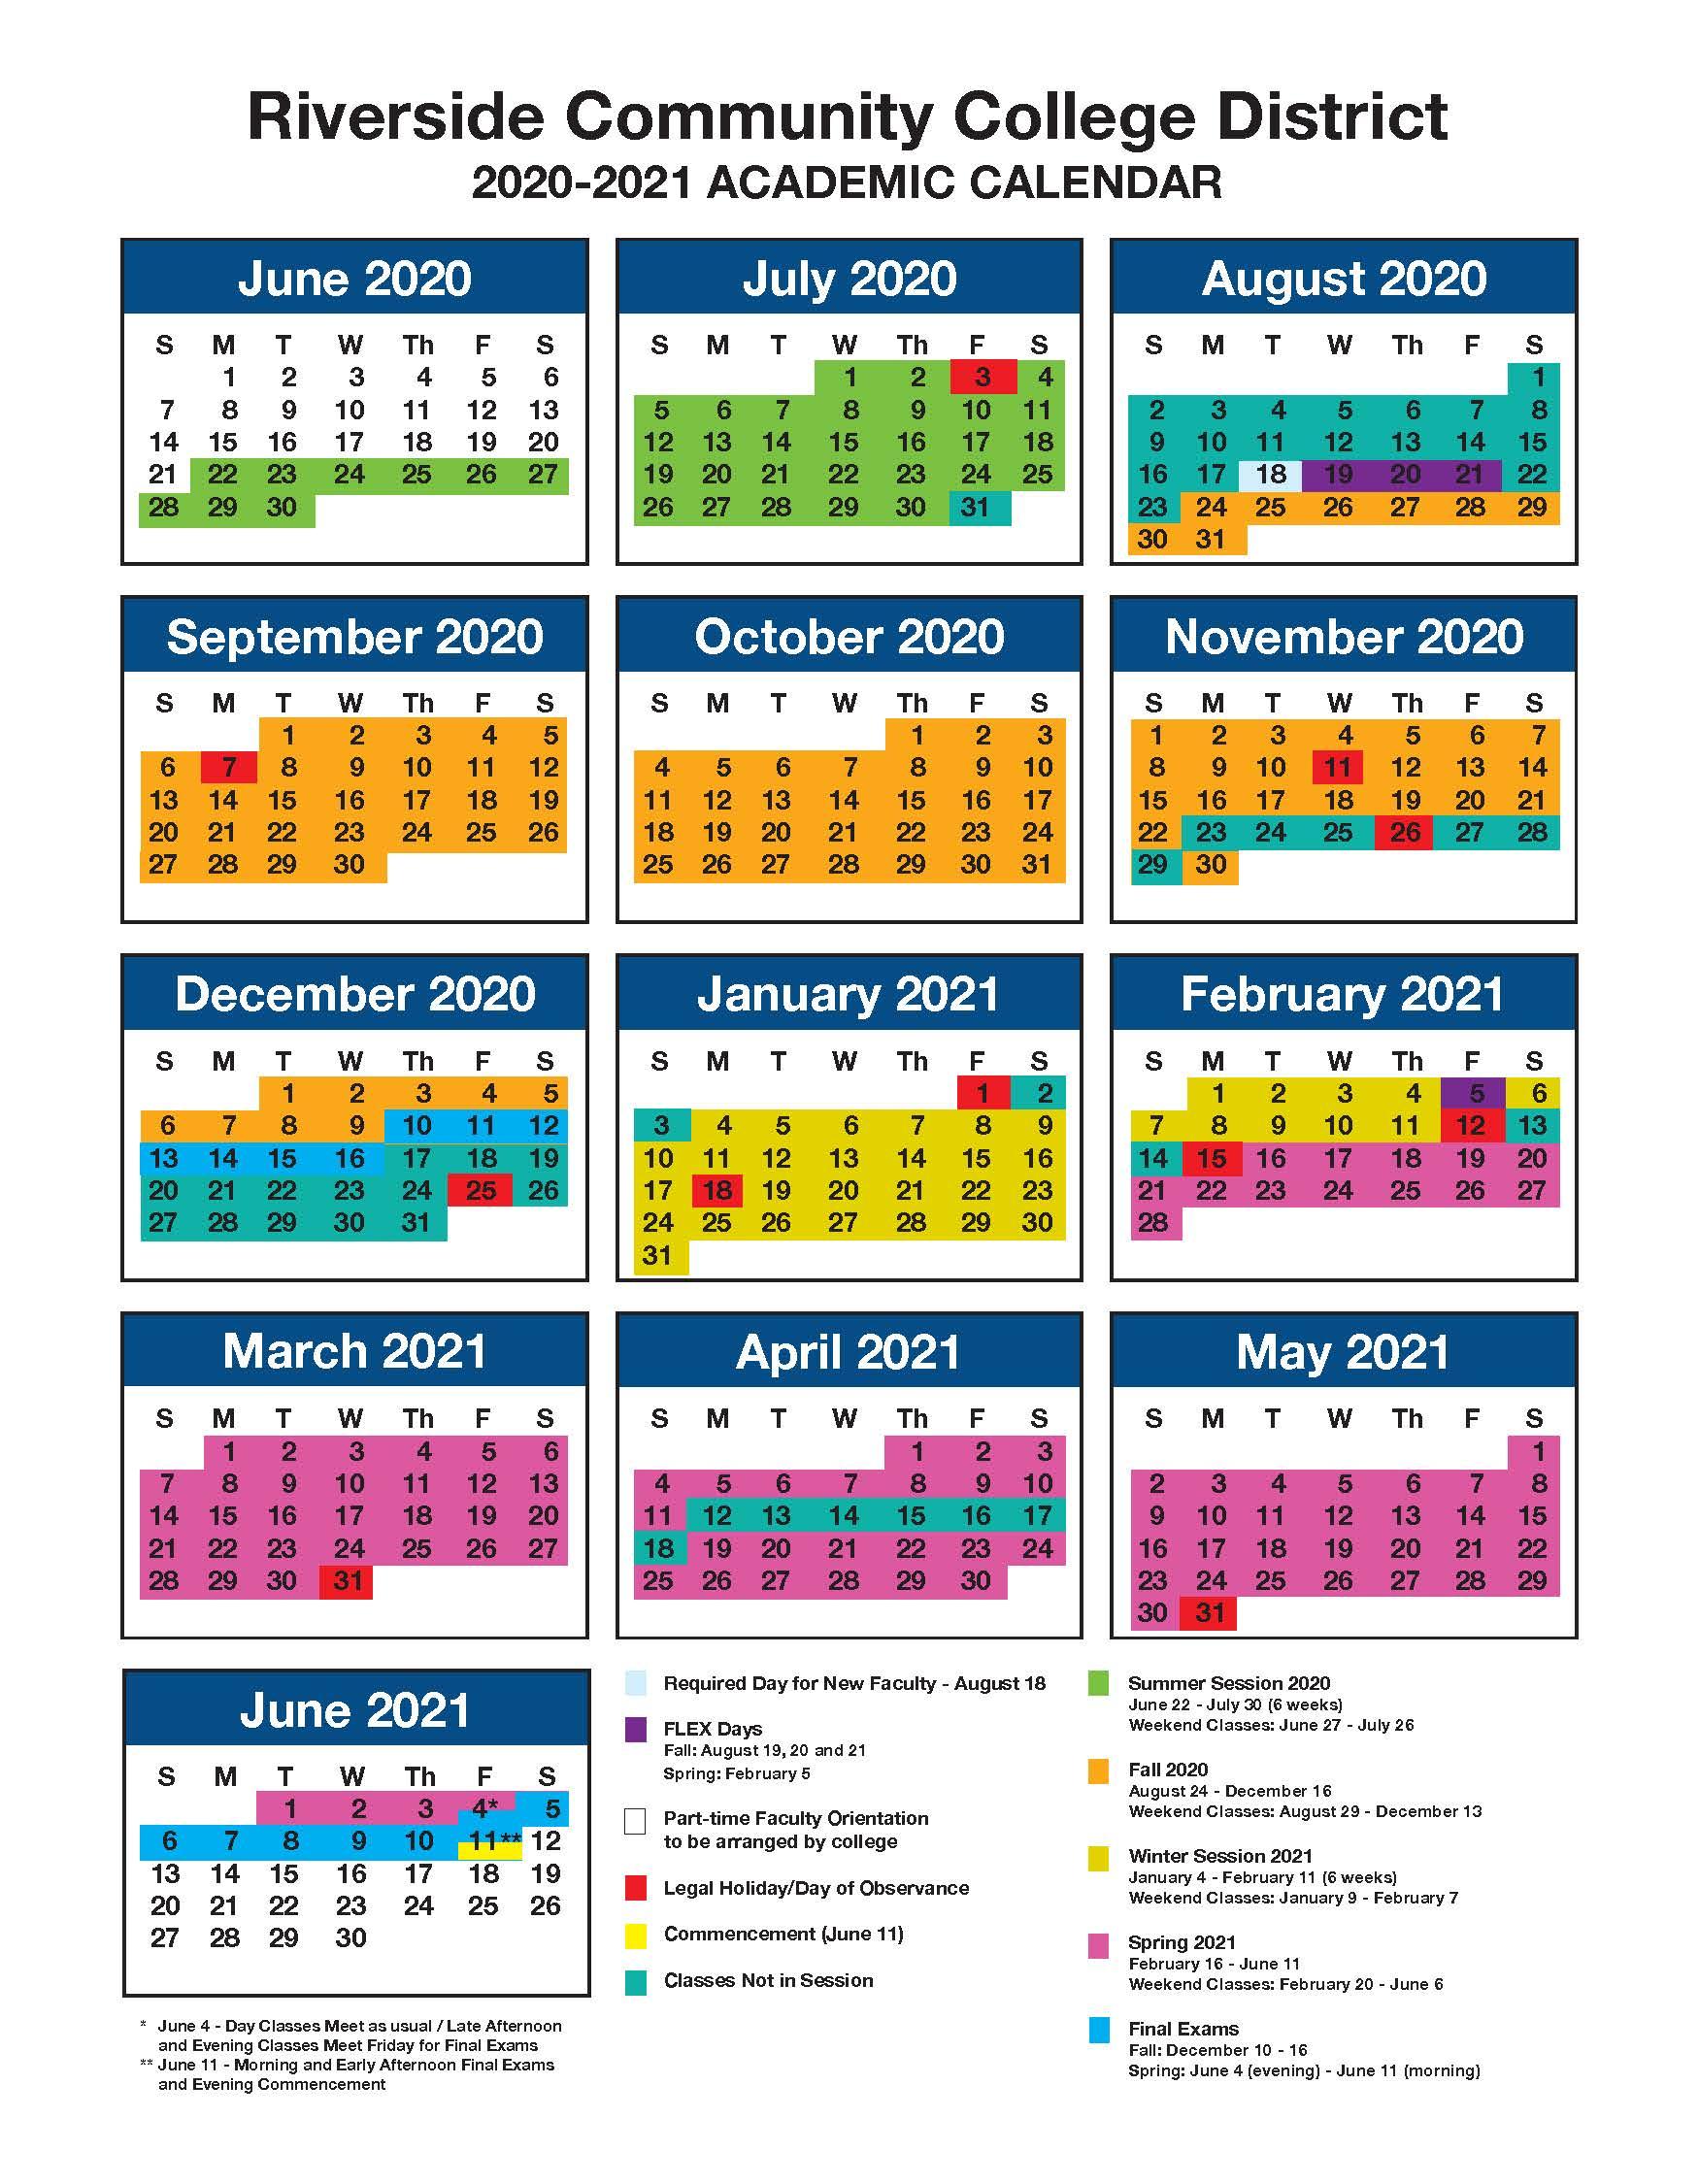 University Of Southern California School Calendar 2021 With University Of Phoenix 2021 Calendar